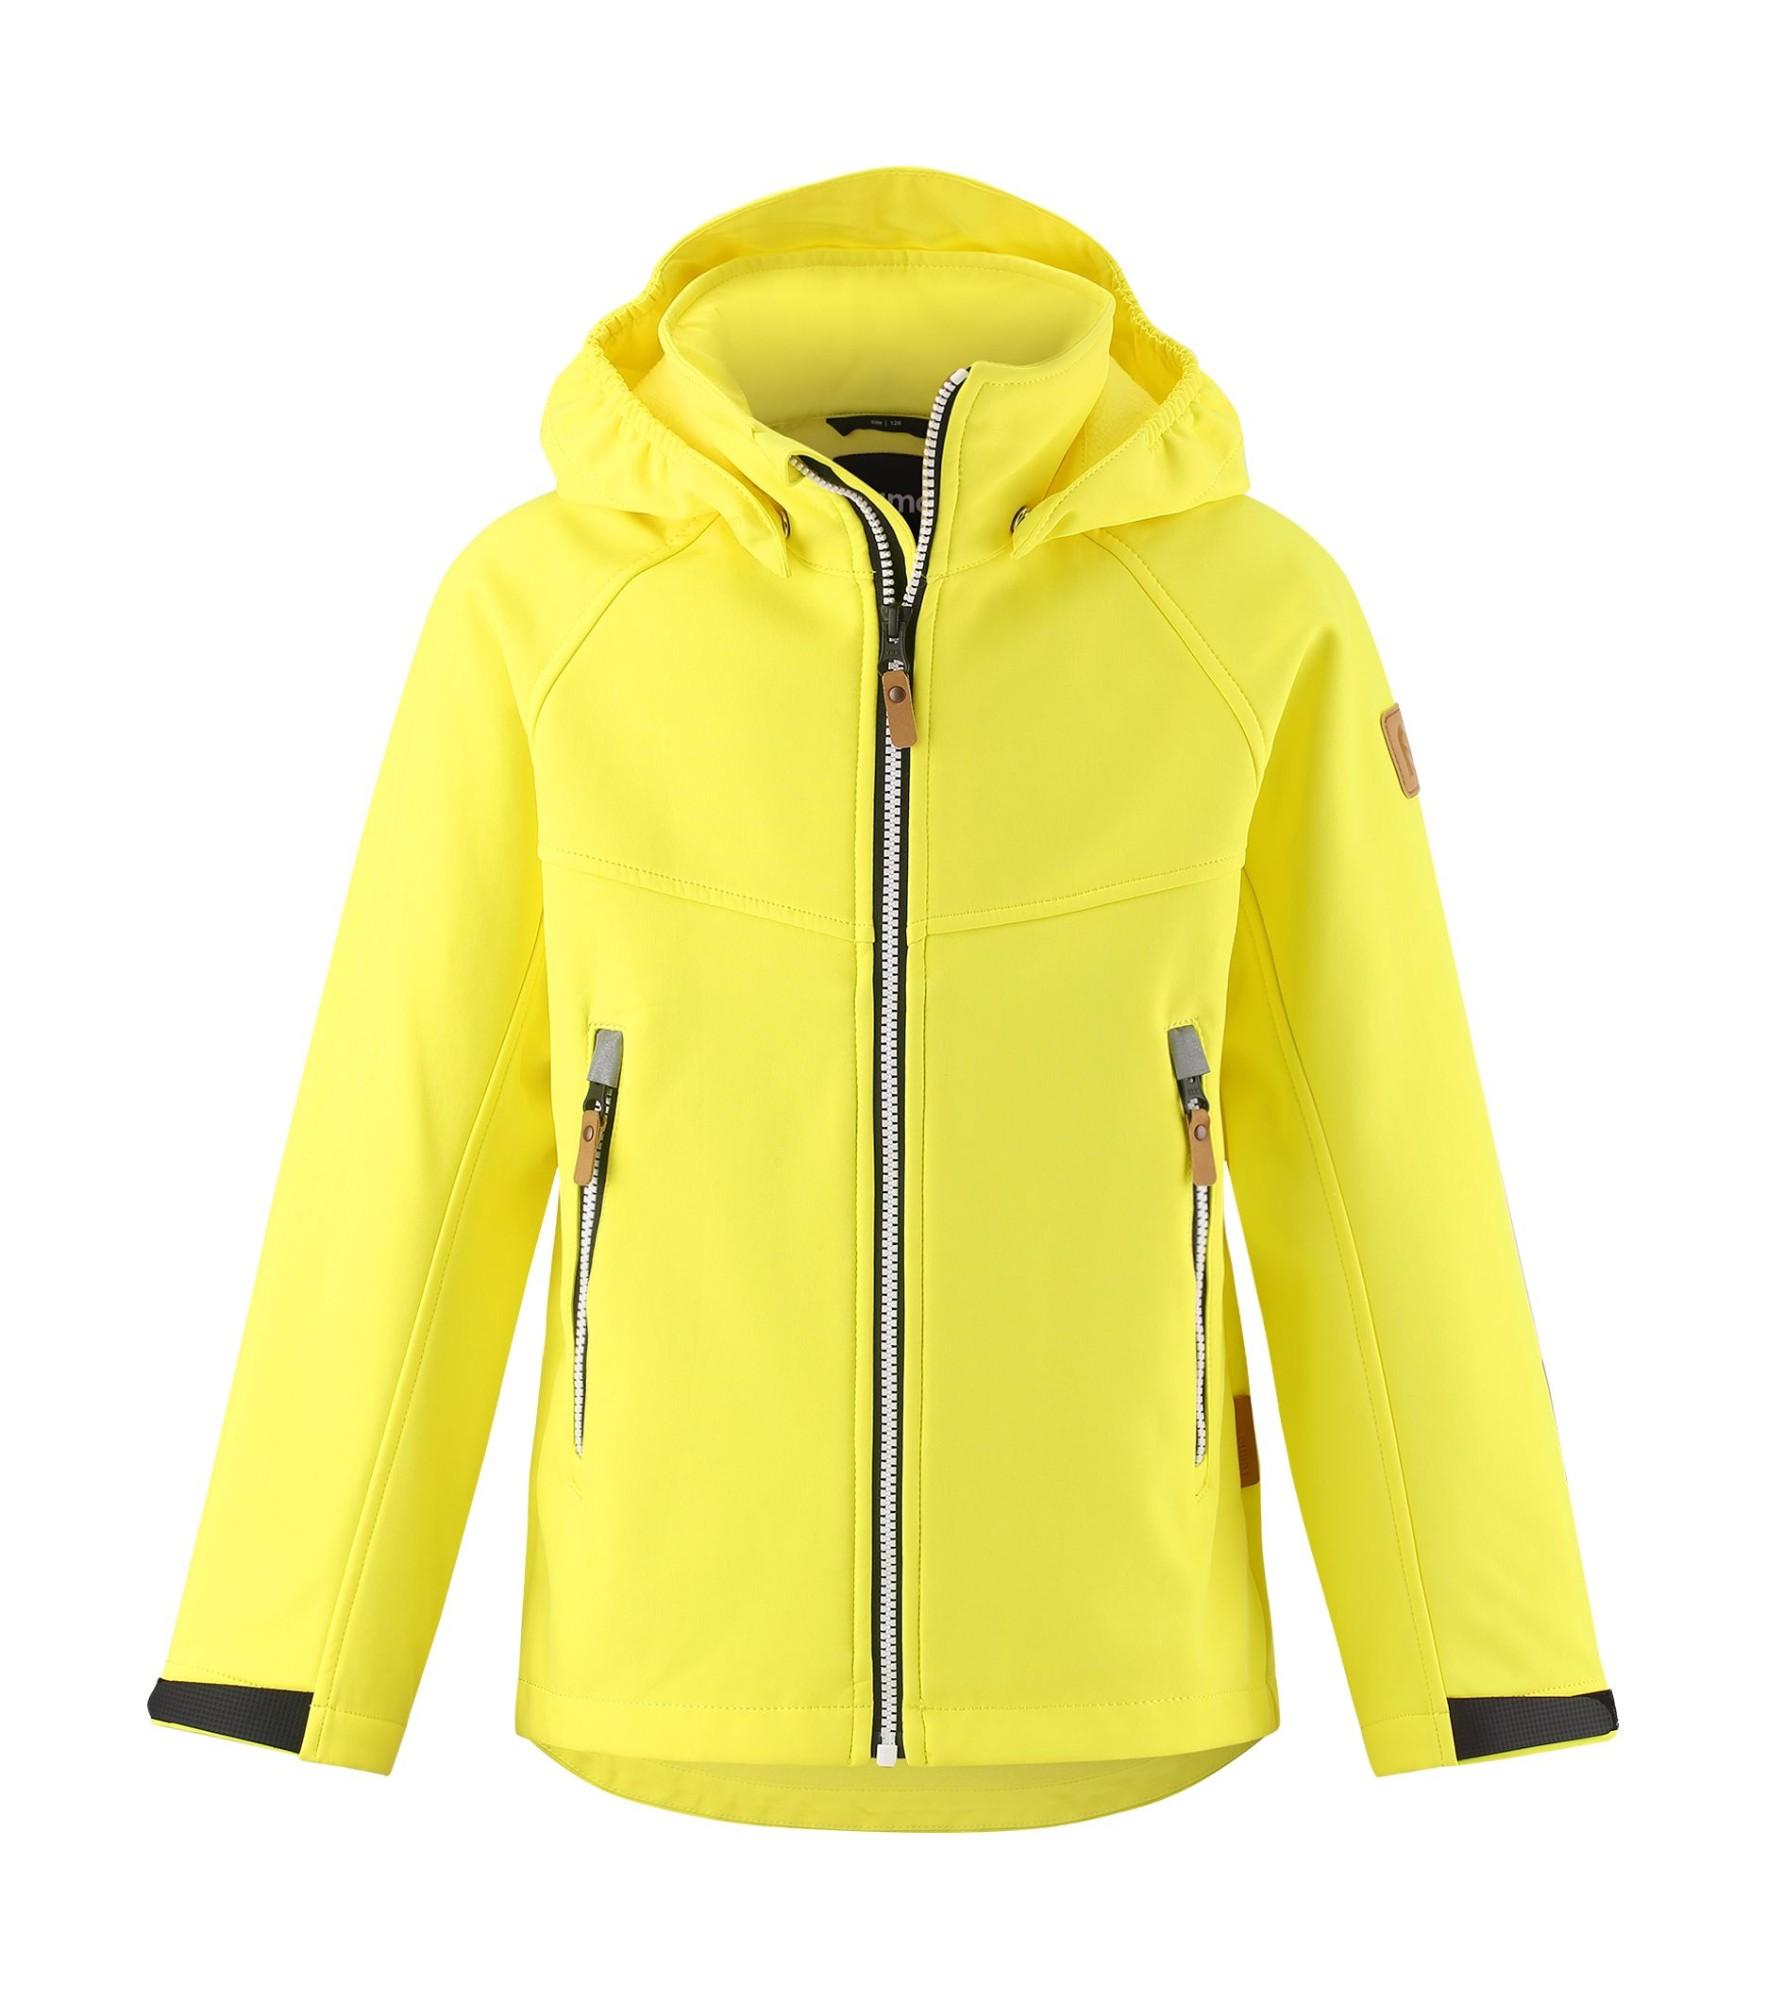 REIMA Vild Lemon Yellow 164